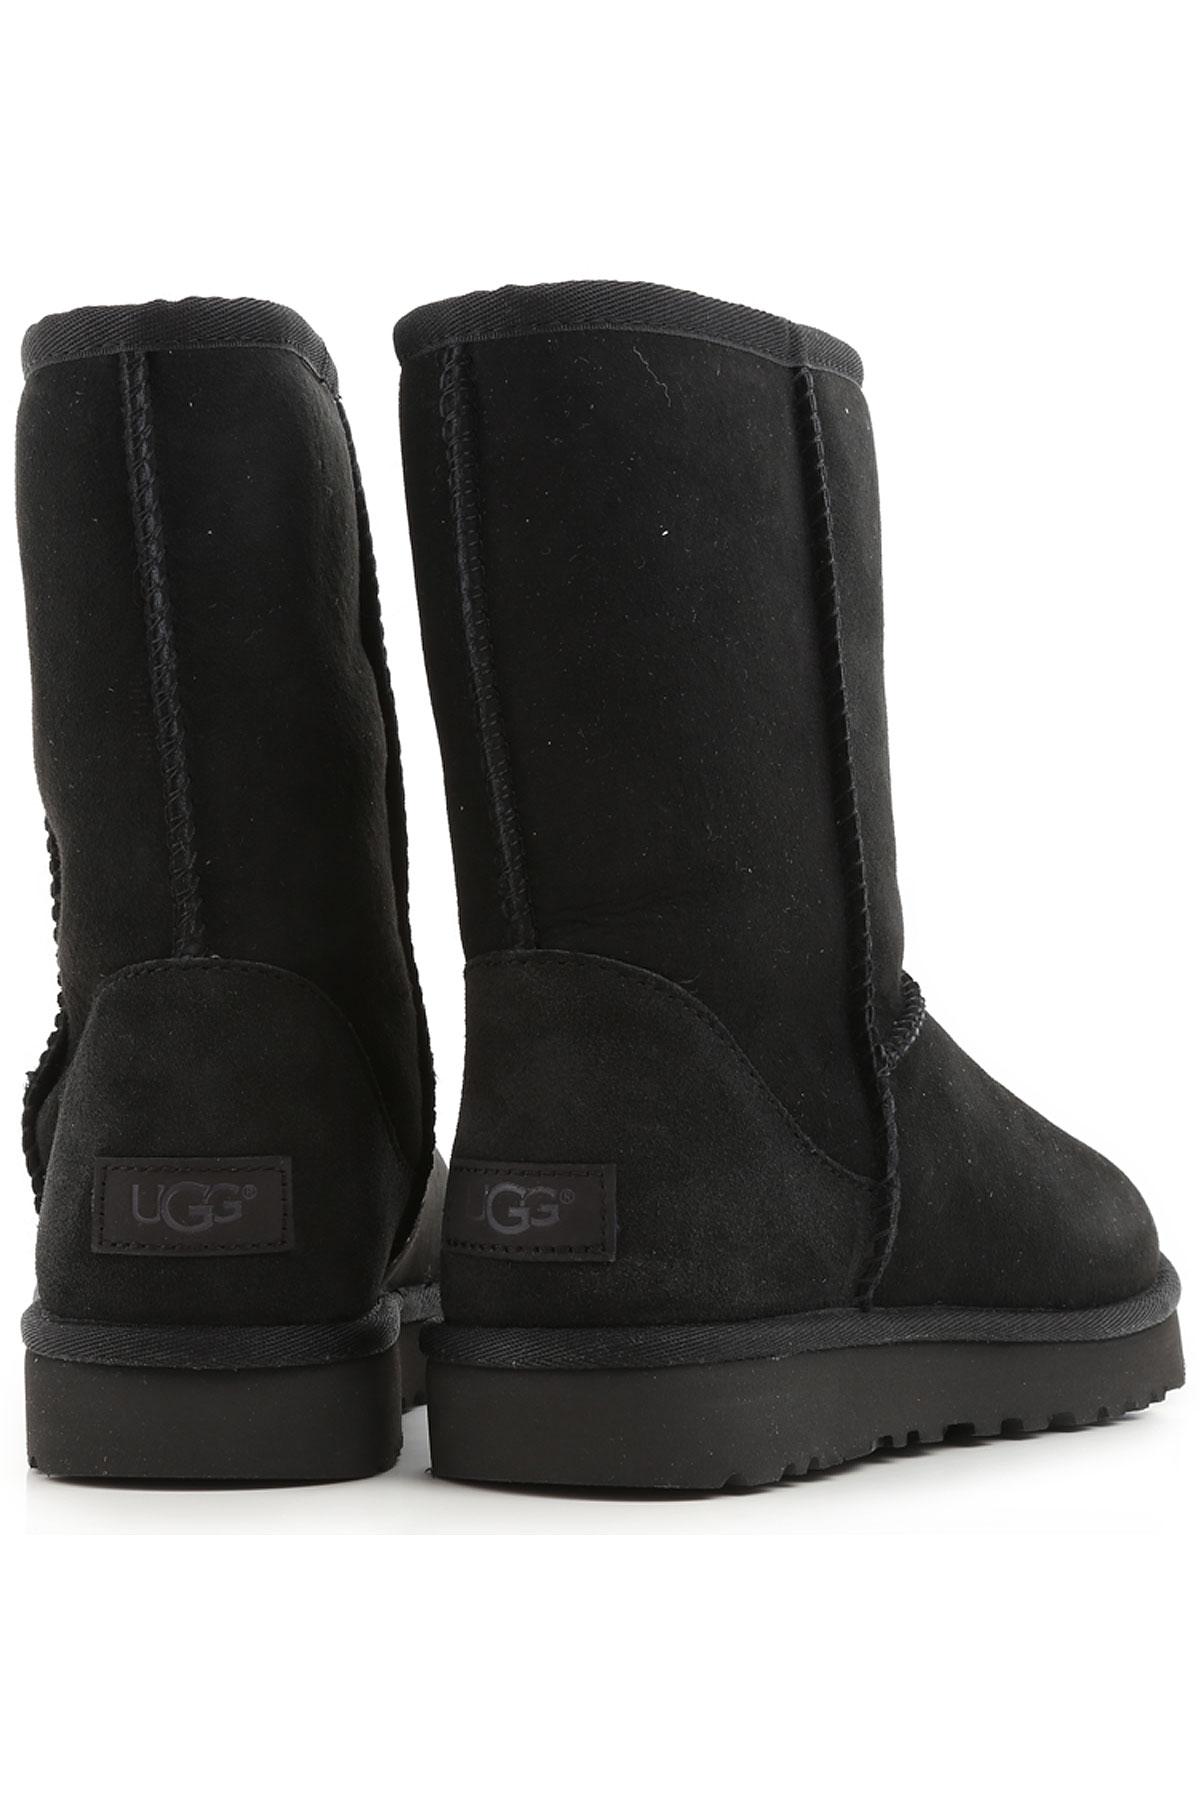 Para nbsp; Otoño Negro 19 Mujer invierno Zapatos 2018 Ugg O8wt5q